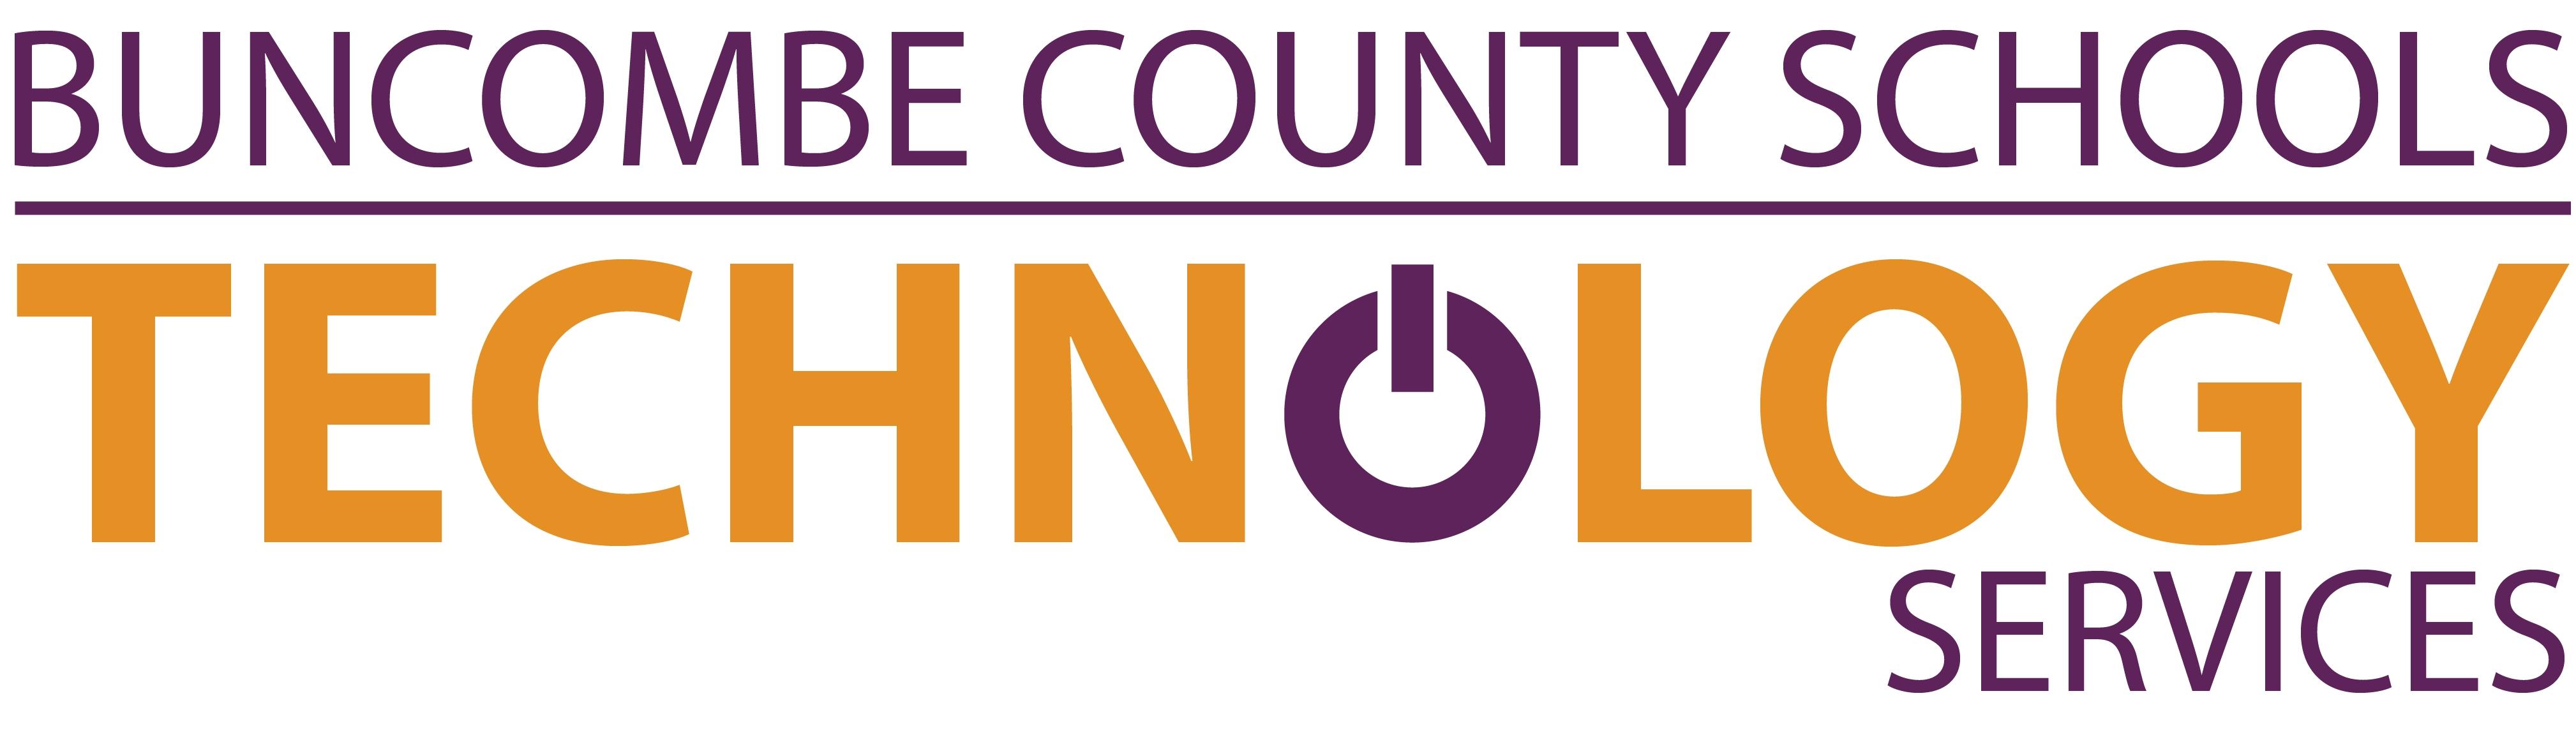 Technology Services - Buncombe County Schools School Calendar Buncombe County